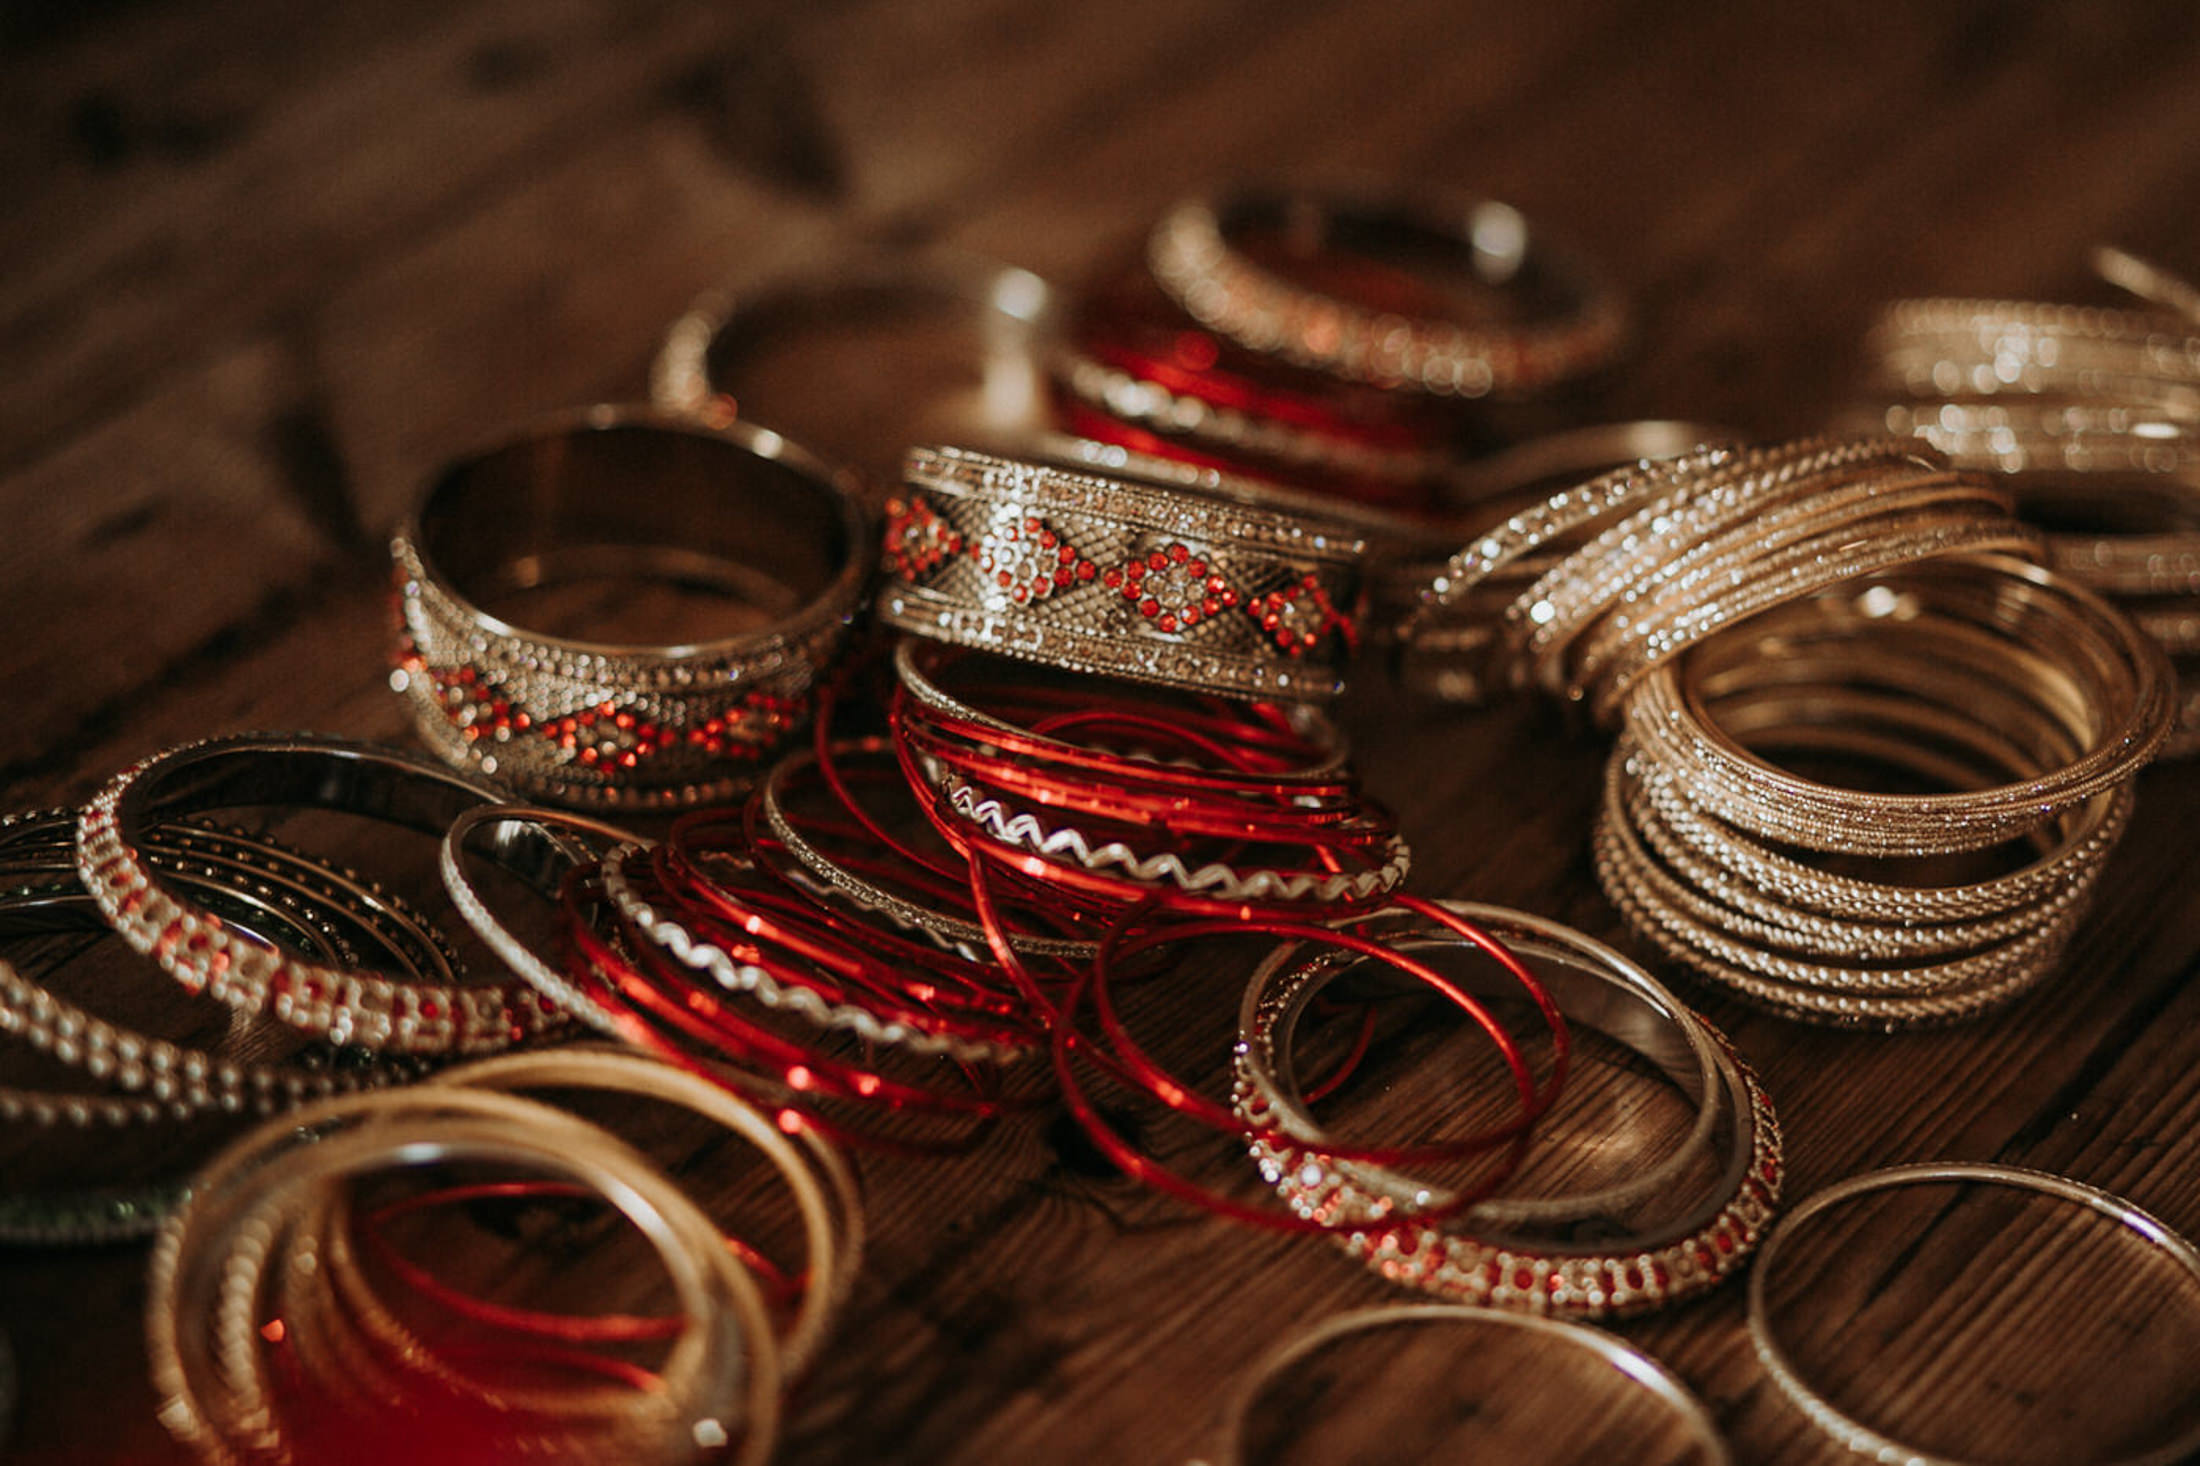 Wedding_Photographer_Mallorca_Daniela-Marquardt_Photography_New_York_Iceland_Tuscany_Santorini_Portugal_Austria_Bavaria_Elopement_Hochzeitsfotograf_AntjeRajat2_1